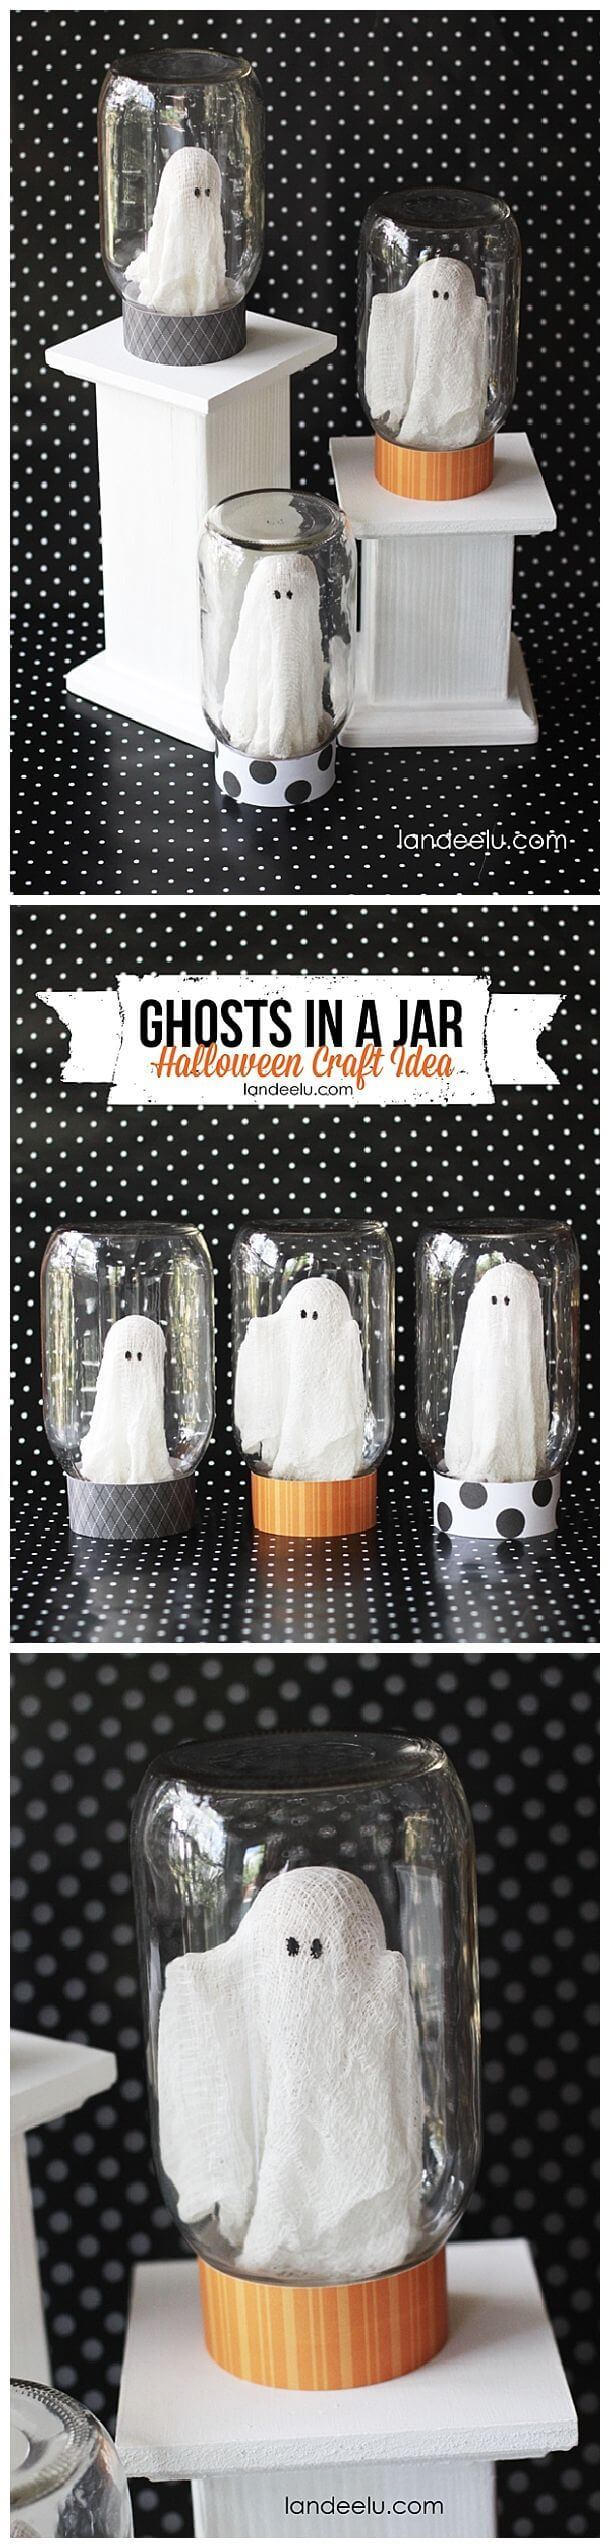 Catch-A-Ghost Halloween Craft Idea